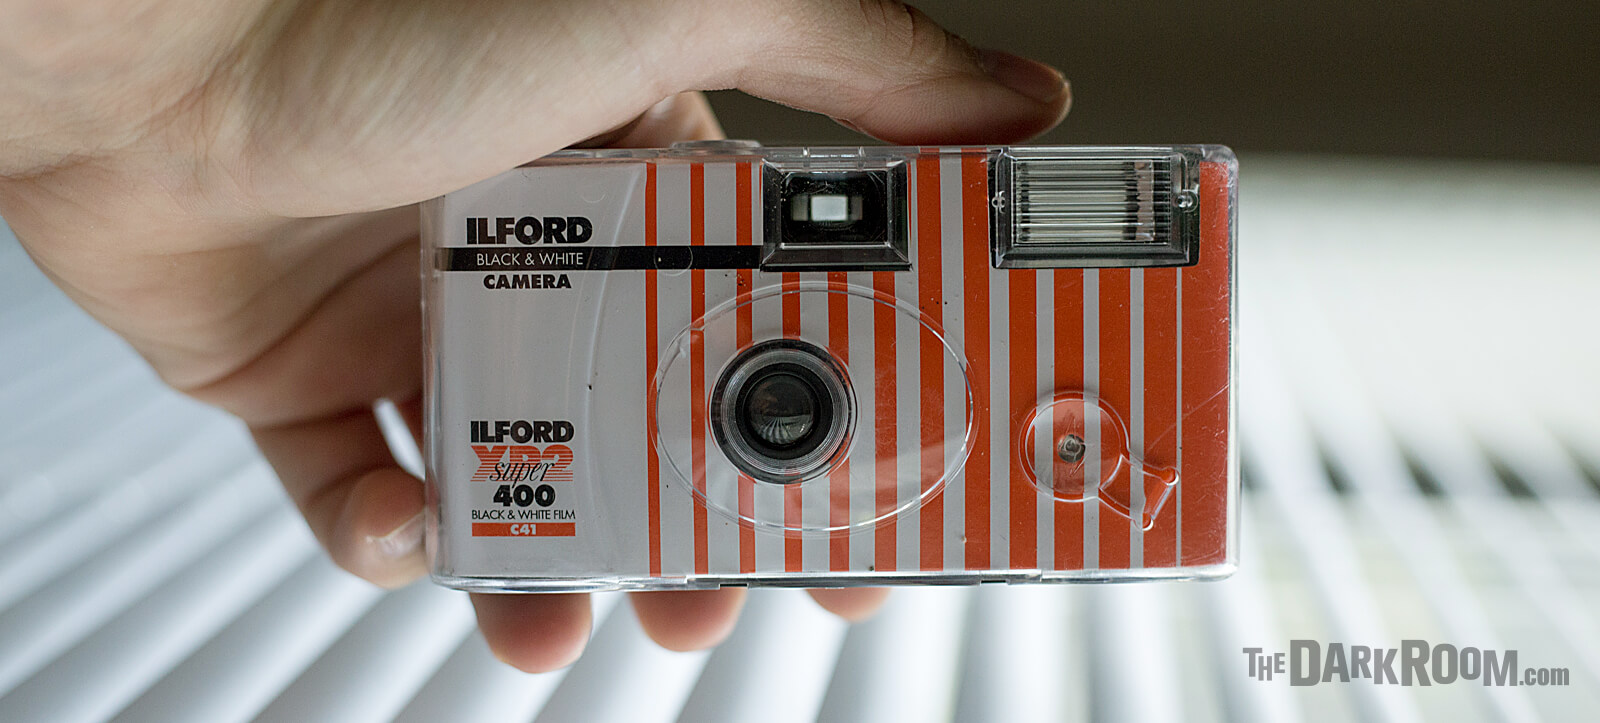 Ilford XP2 Single Use Disposable Camera